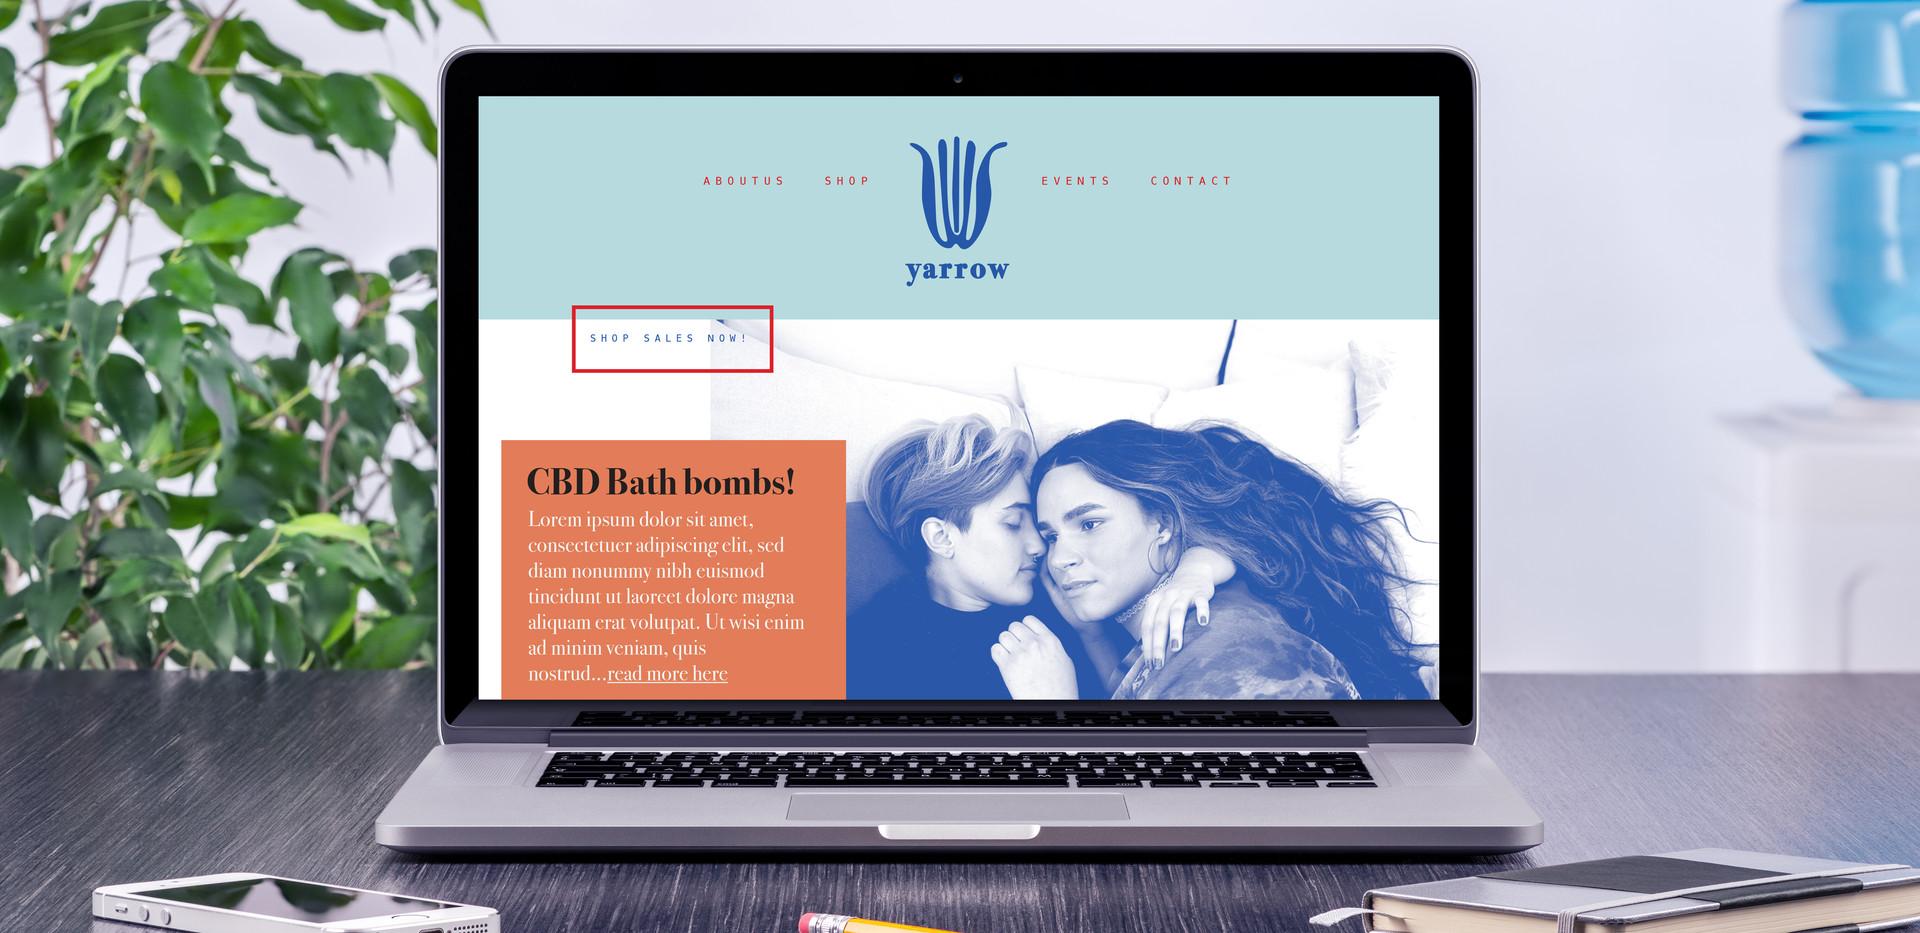 YARROW-conceptA-website.jpg